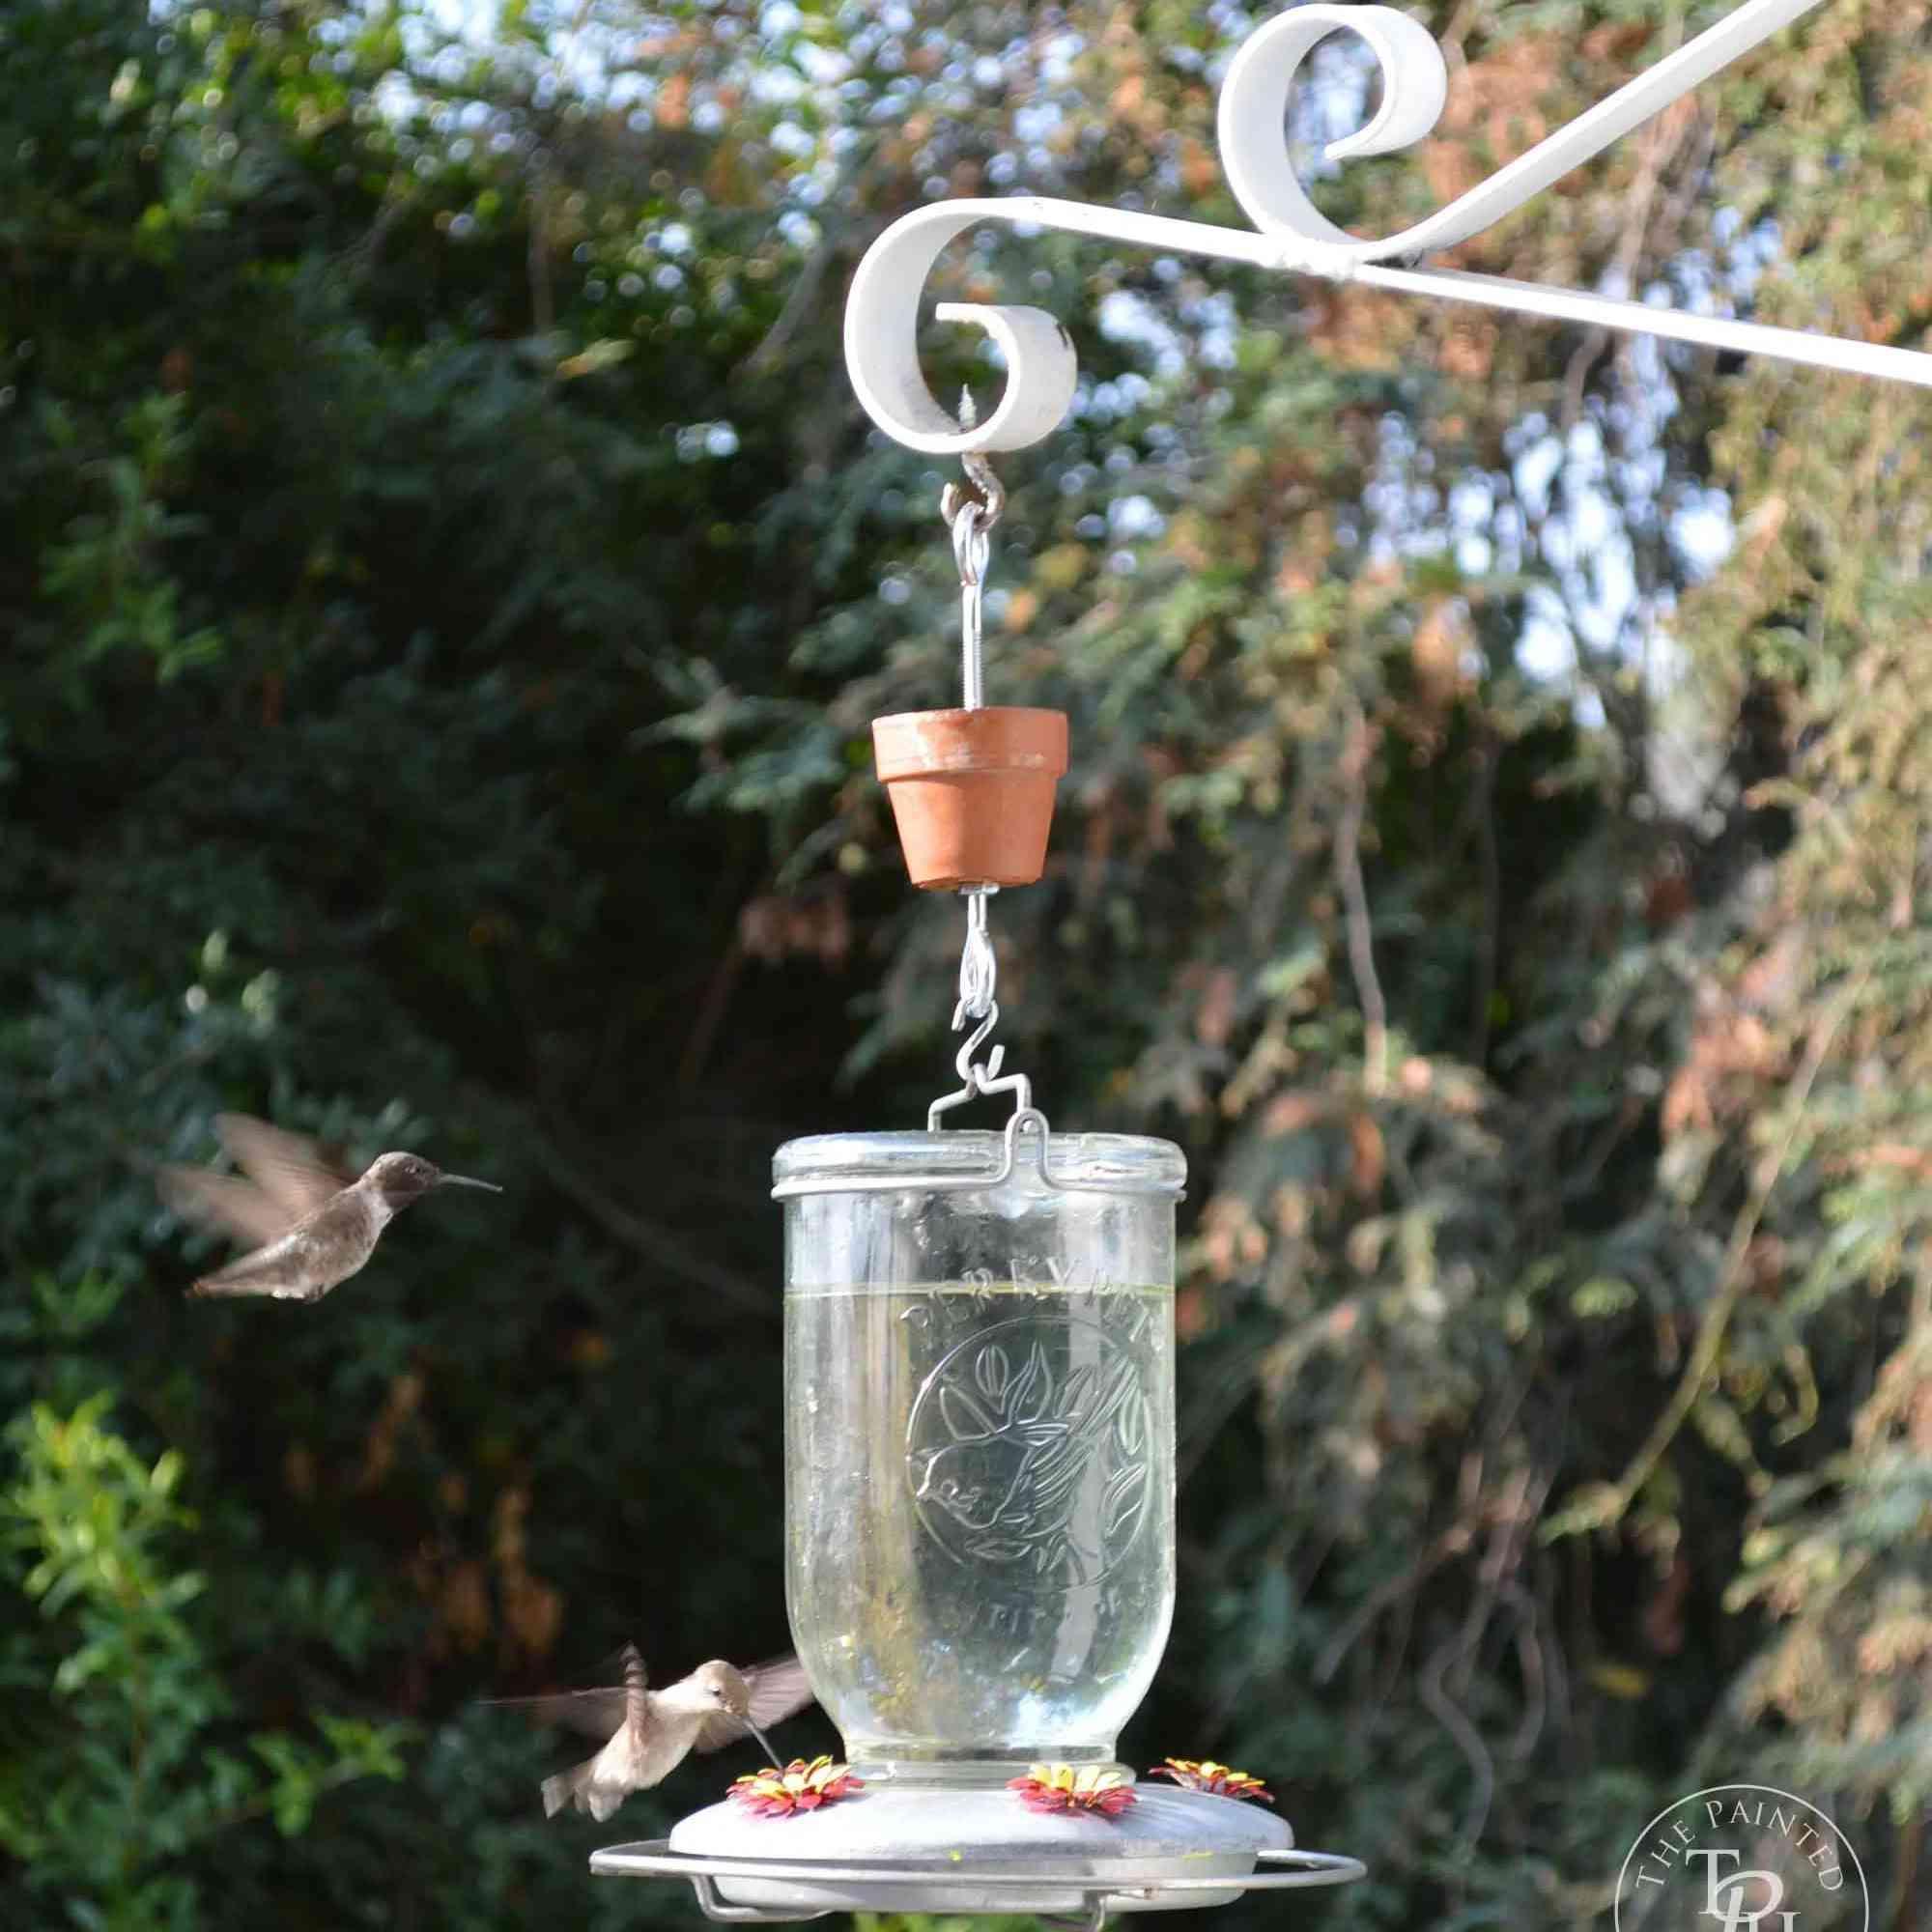 A hummingbird feeder with hummingbirds